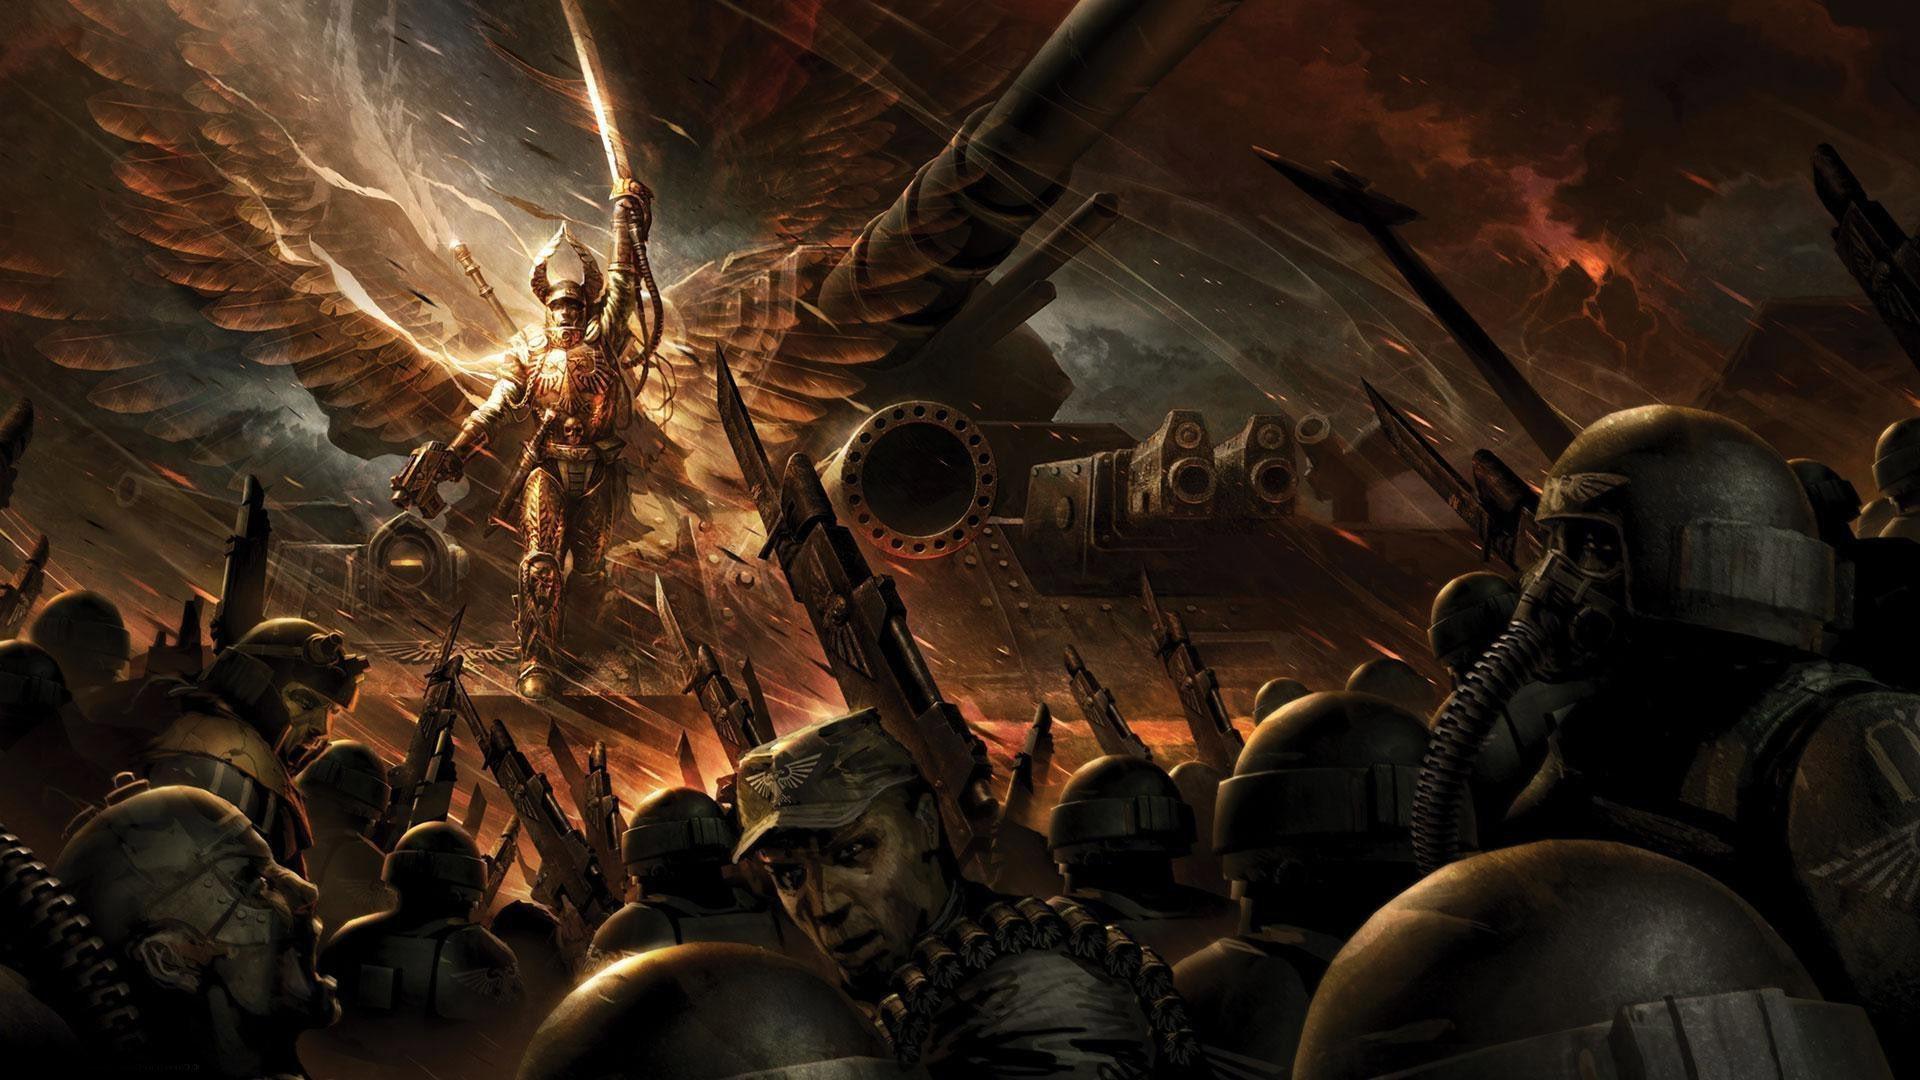 Warhammer 40K Chaos Wallpaper (75+ images)